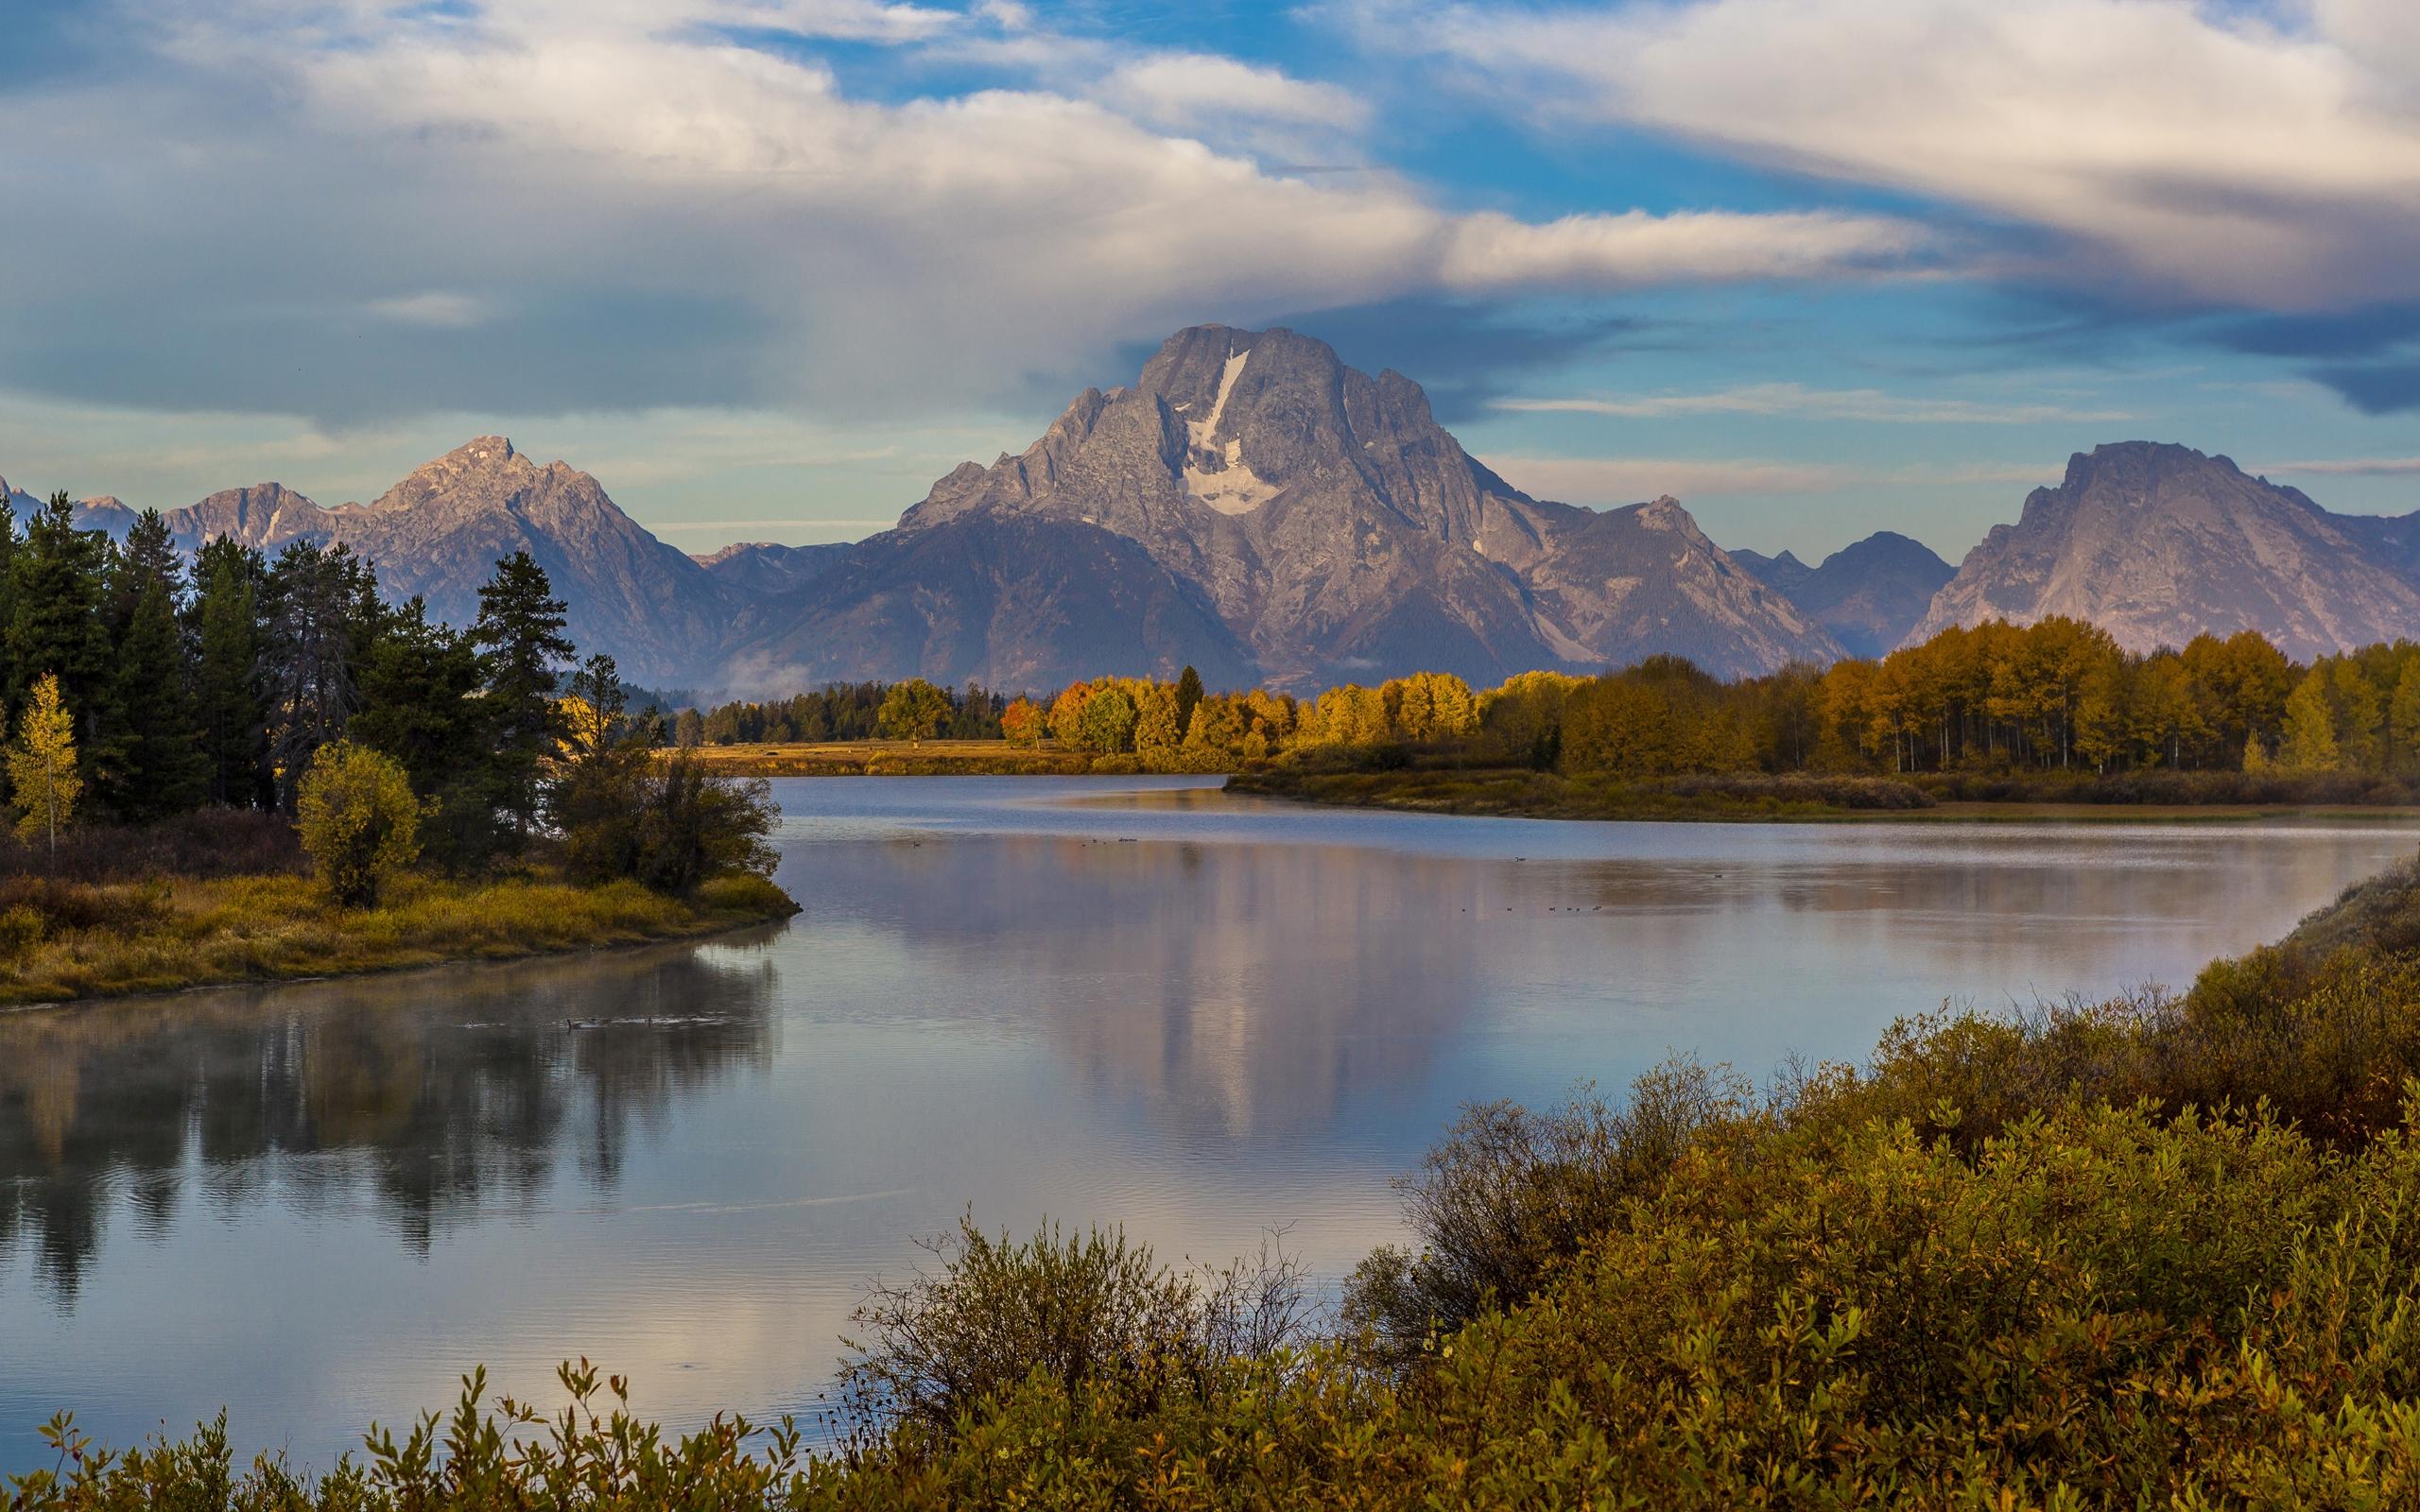 Fall Winter Wallpaper Free Usa Parks Mountains Lake Forests Sky Scenery Grand Teton